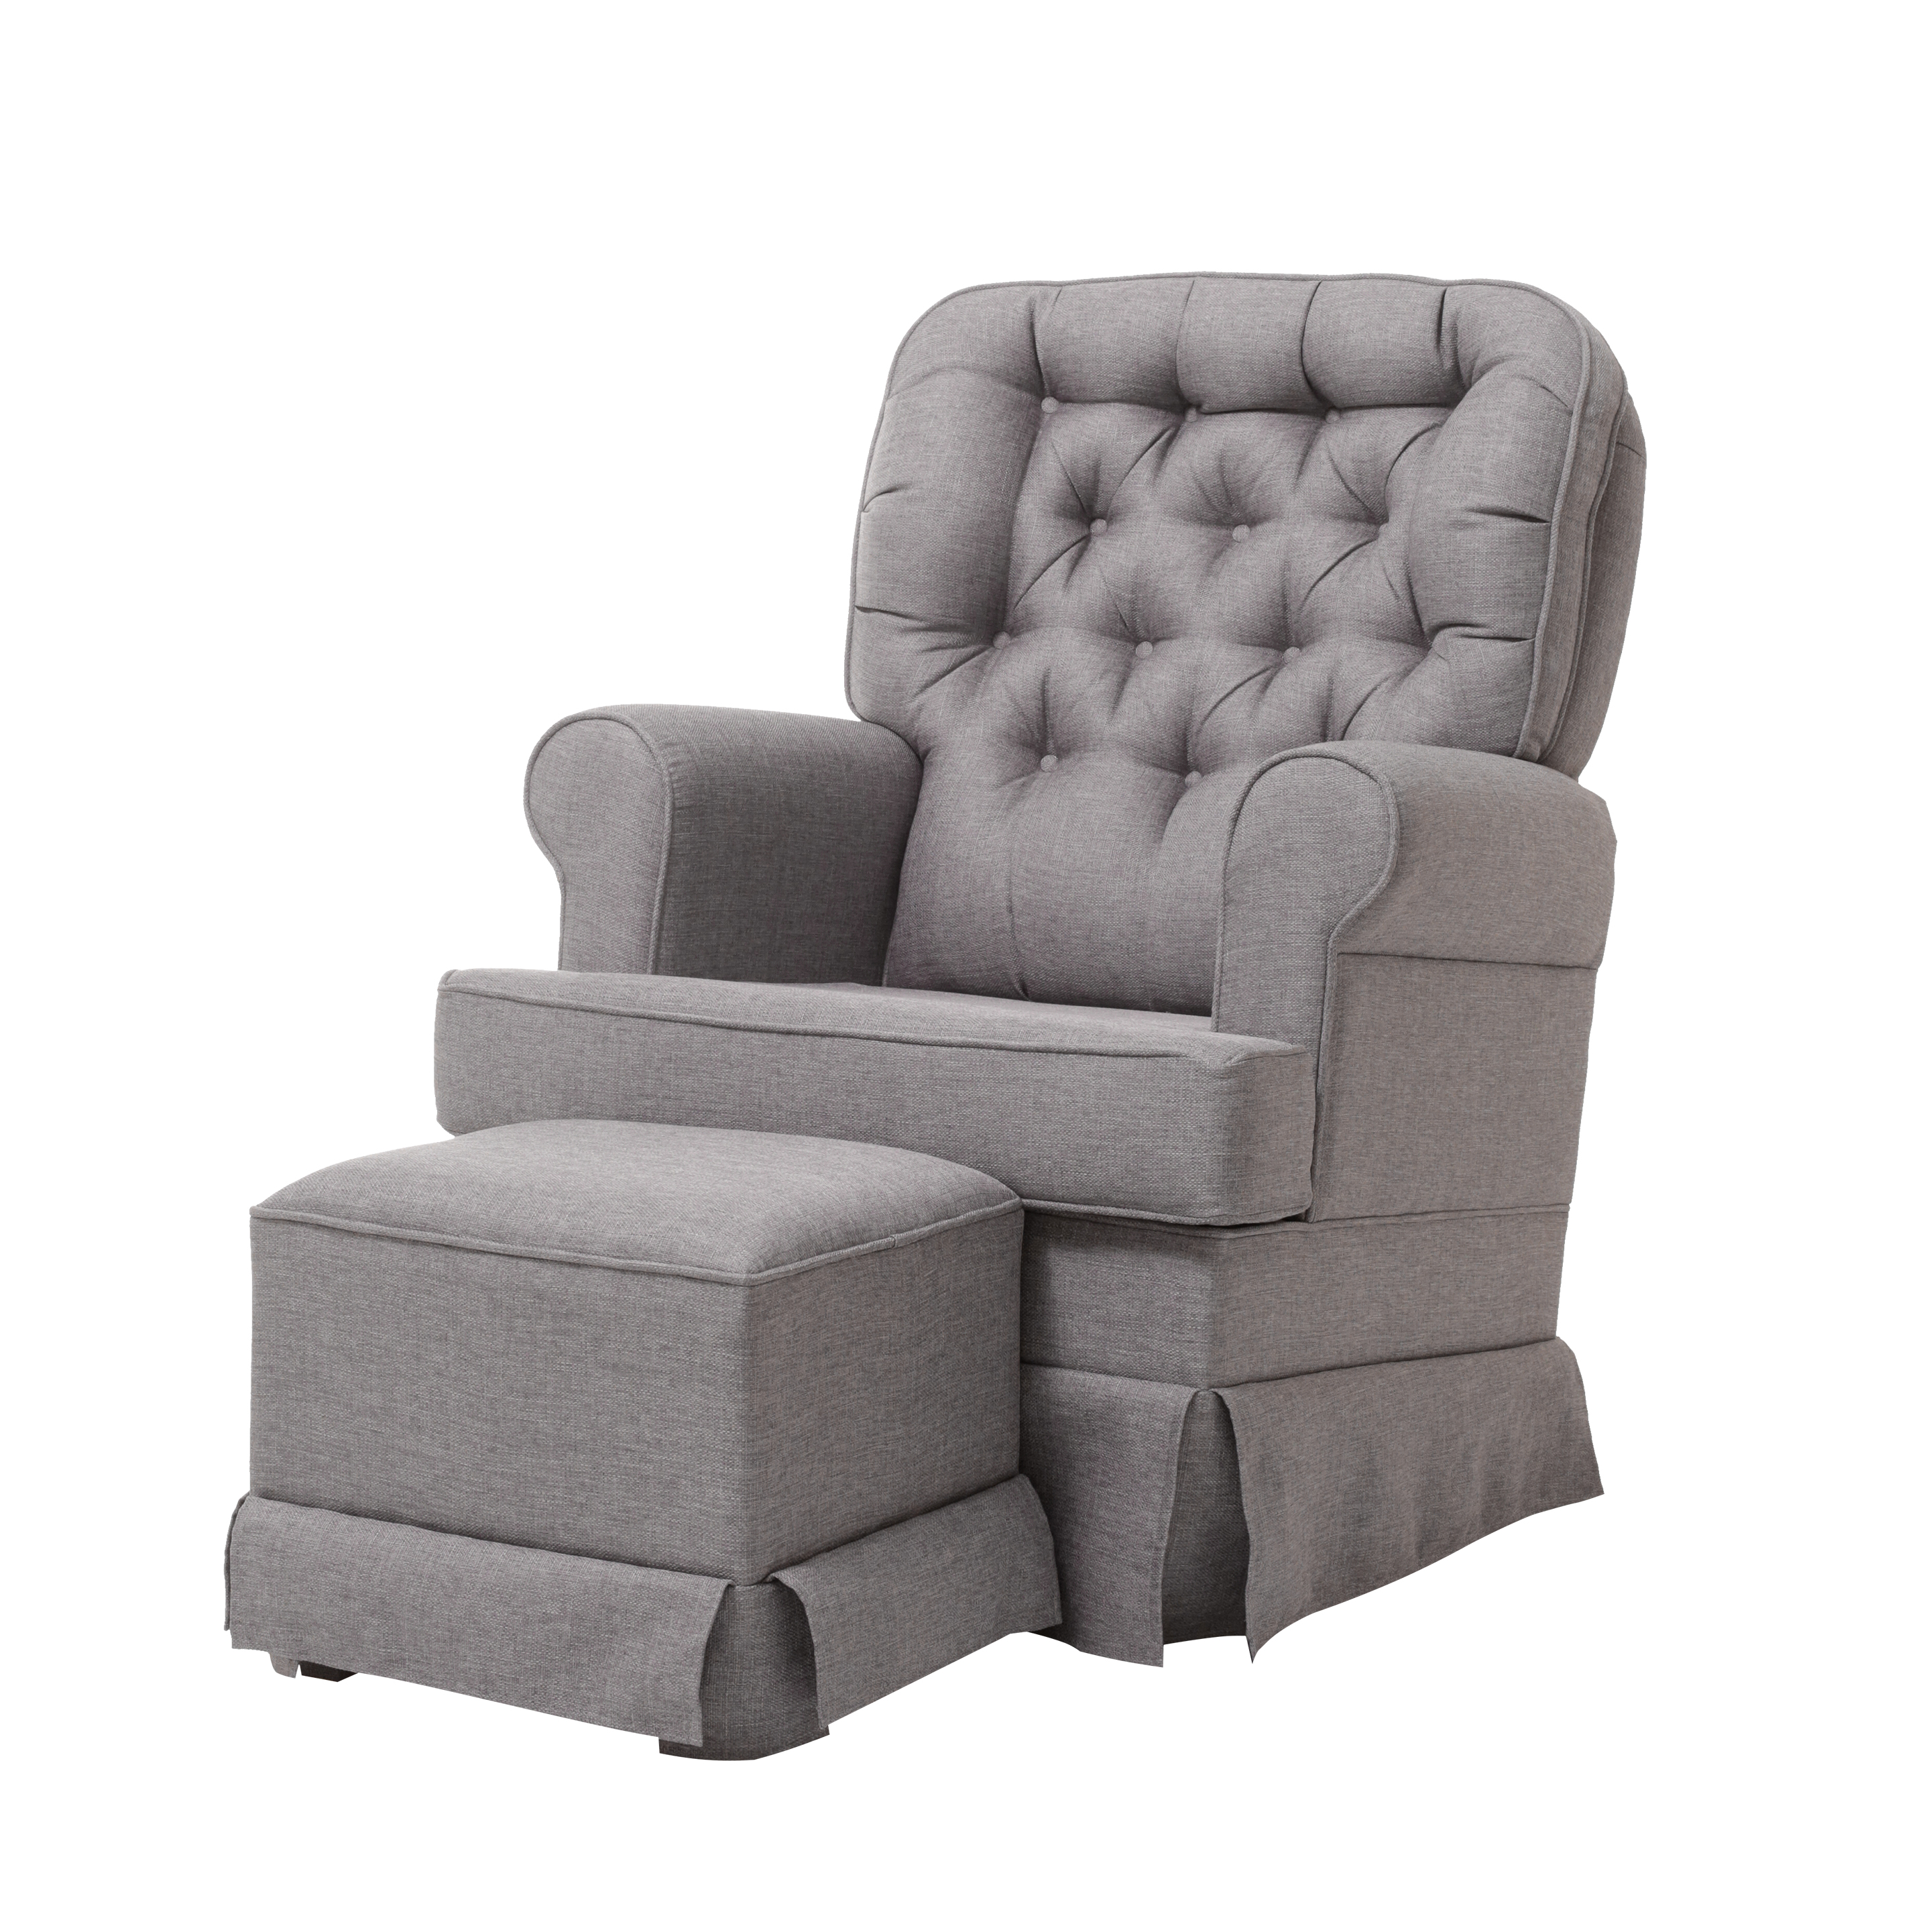 Comfort cinza mescla lado